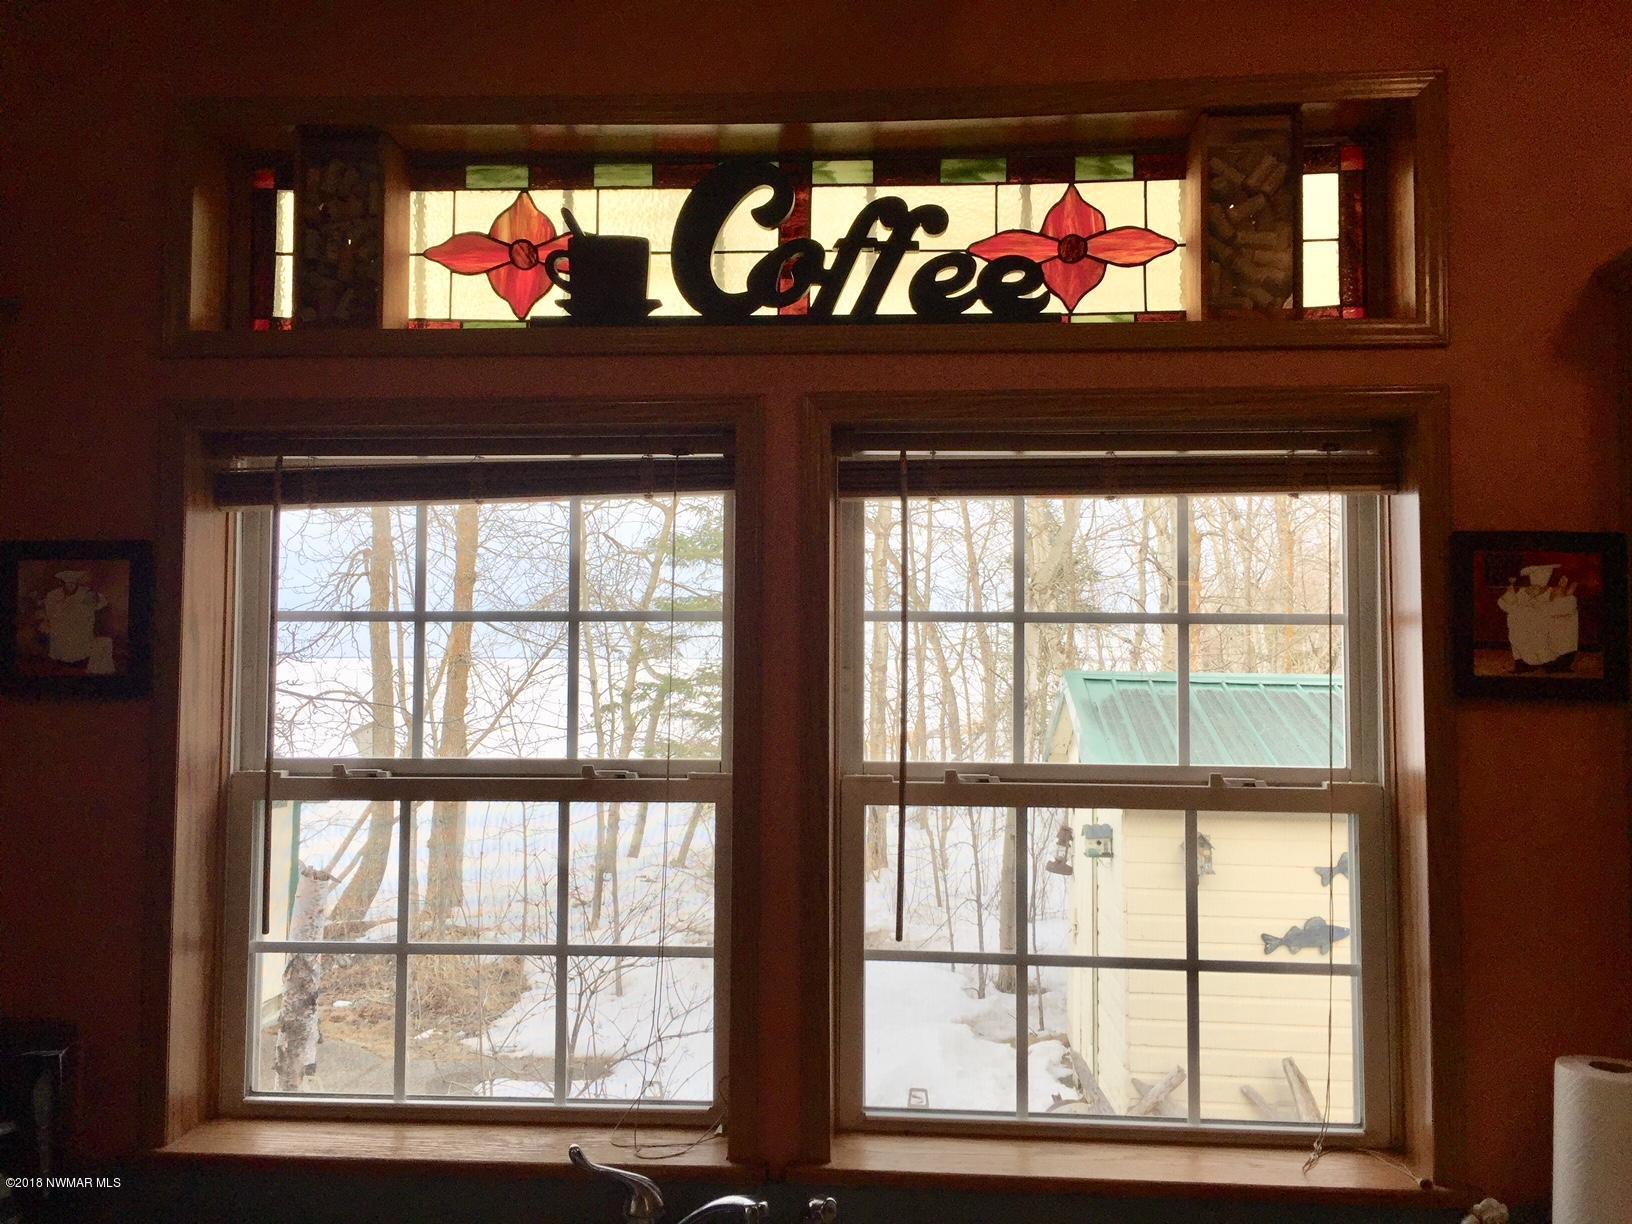 Window over the kitchen sink